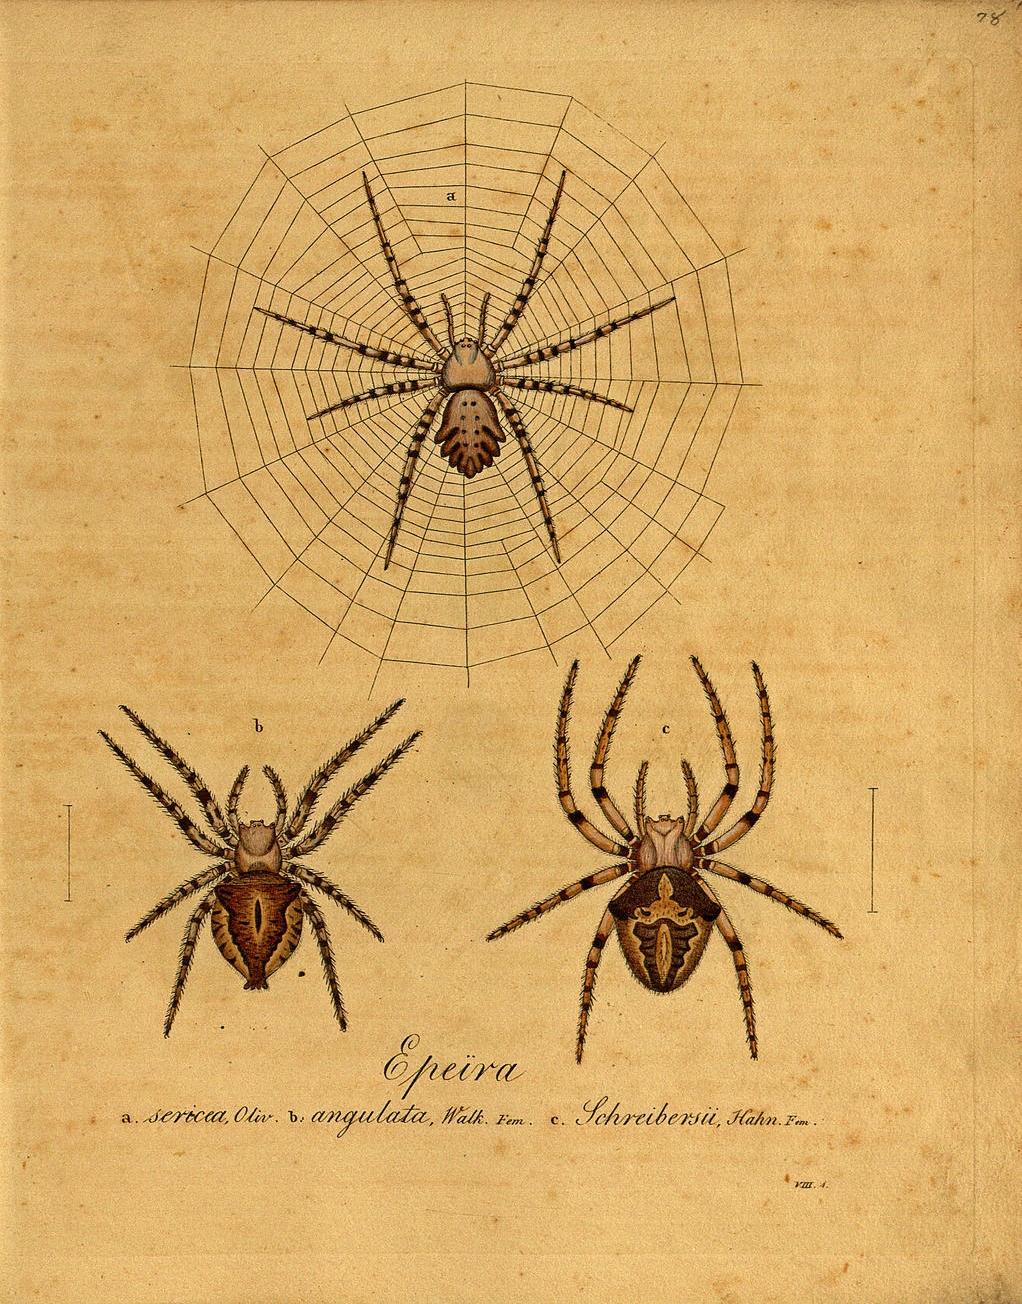 Drawn spider scientific illustration Spider spider Tattoo Illustrations Epeira